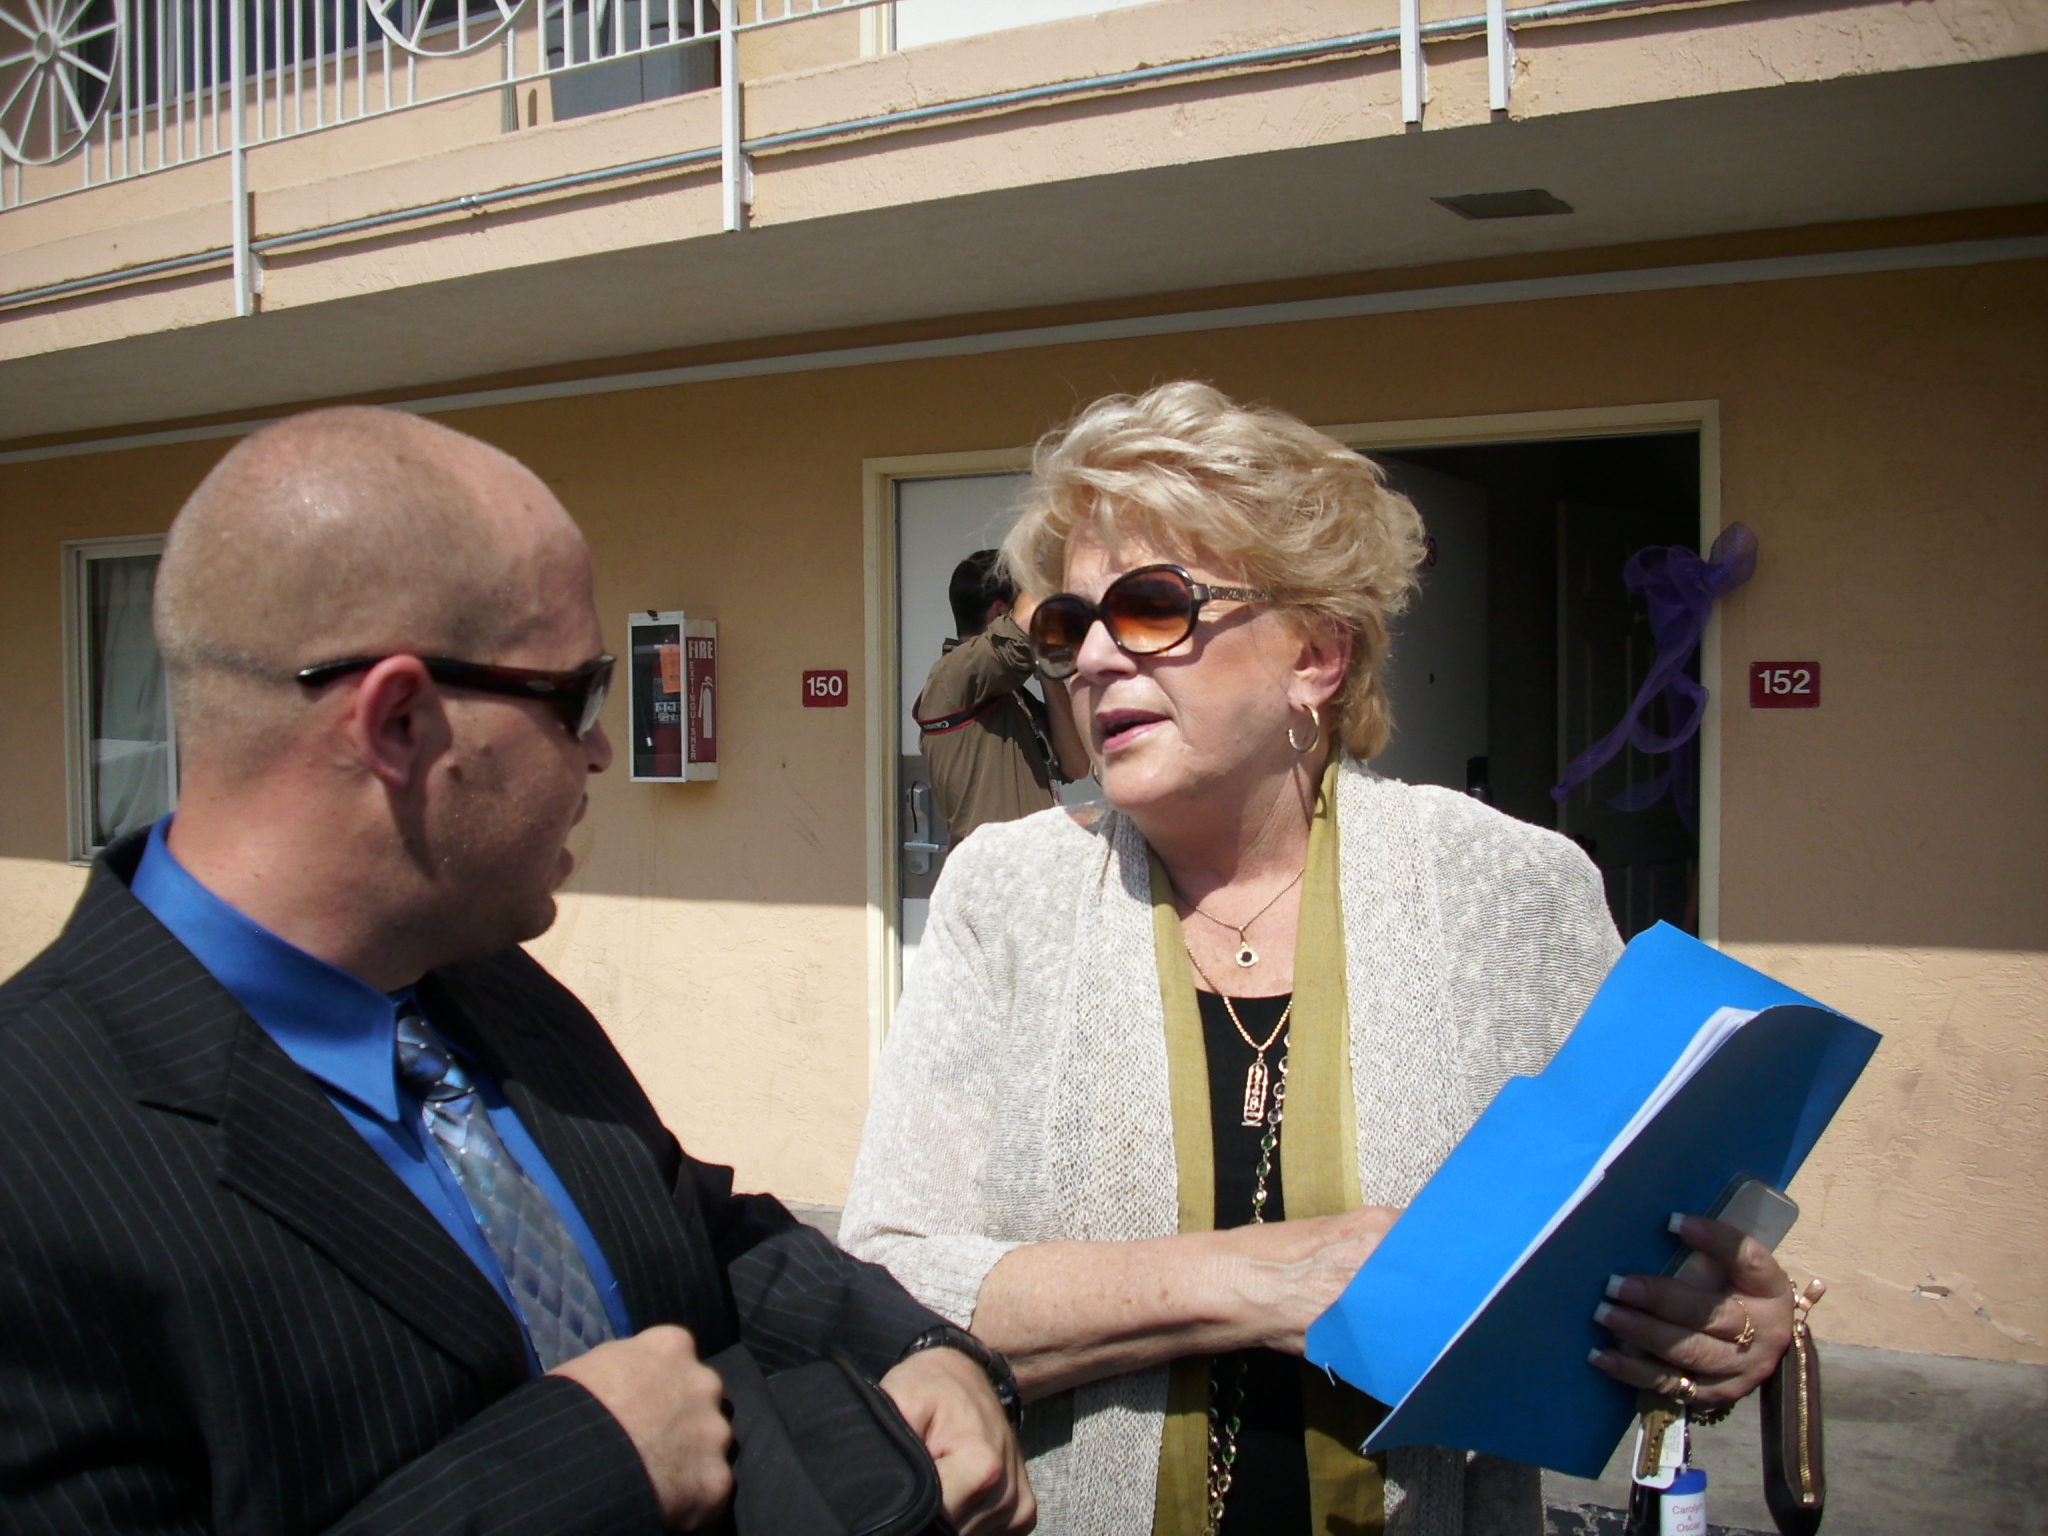 Mayor Carolyn Goodman and Zachary Delbex of Repurpose America